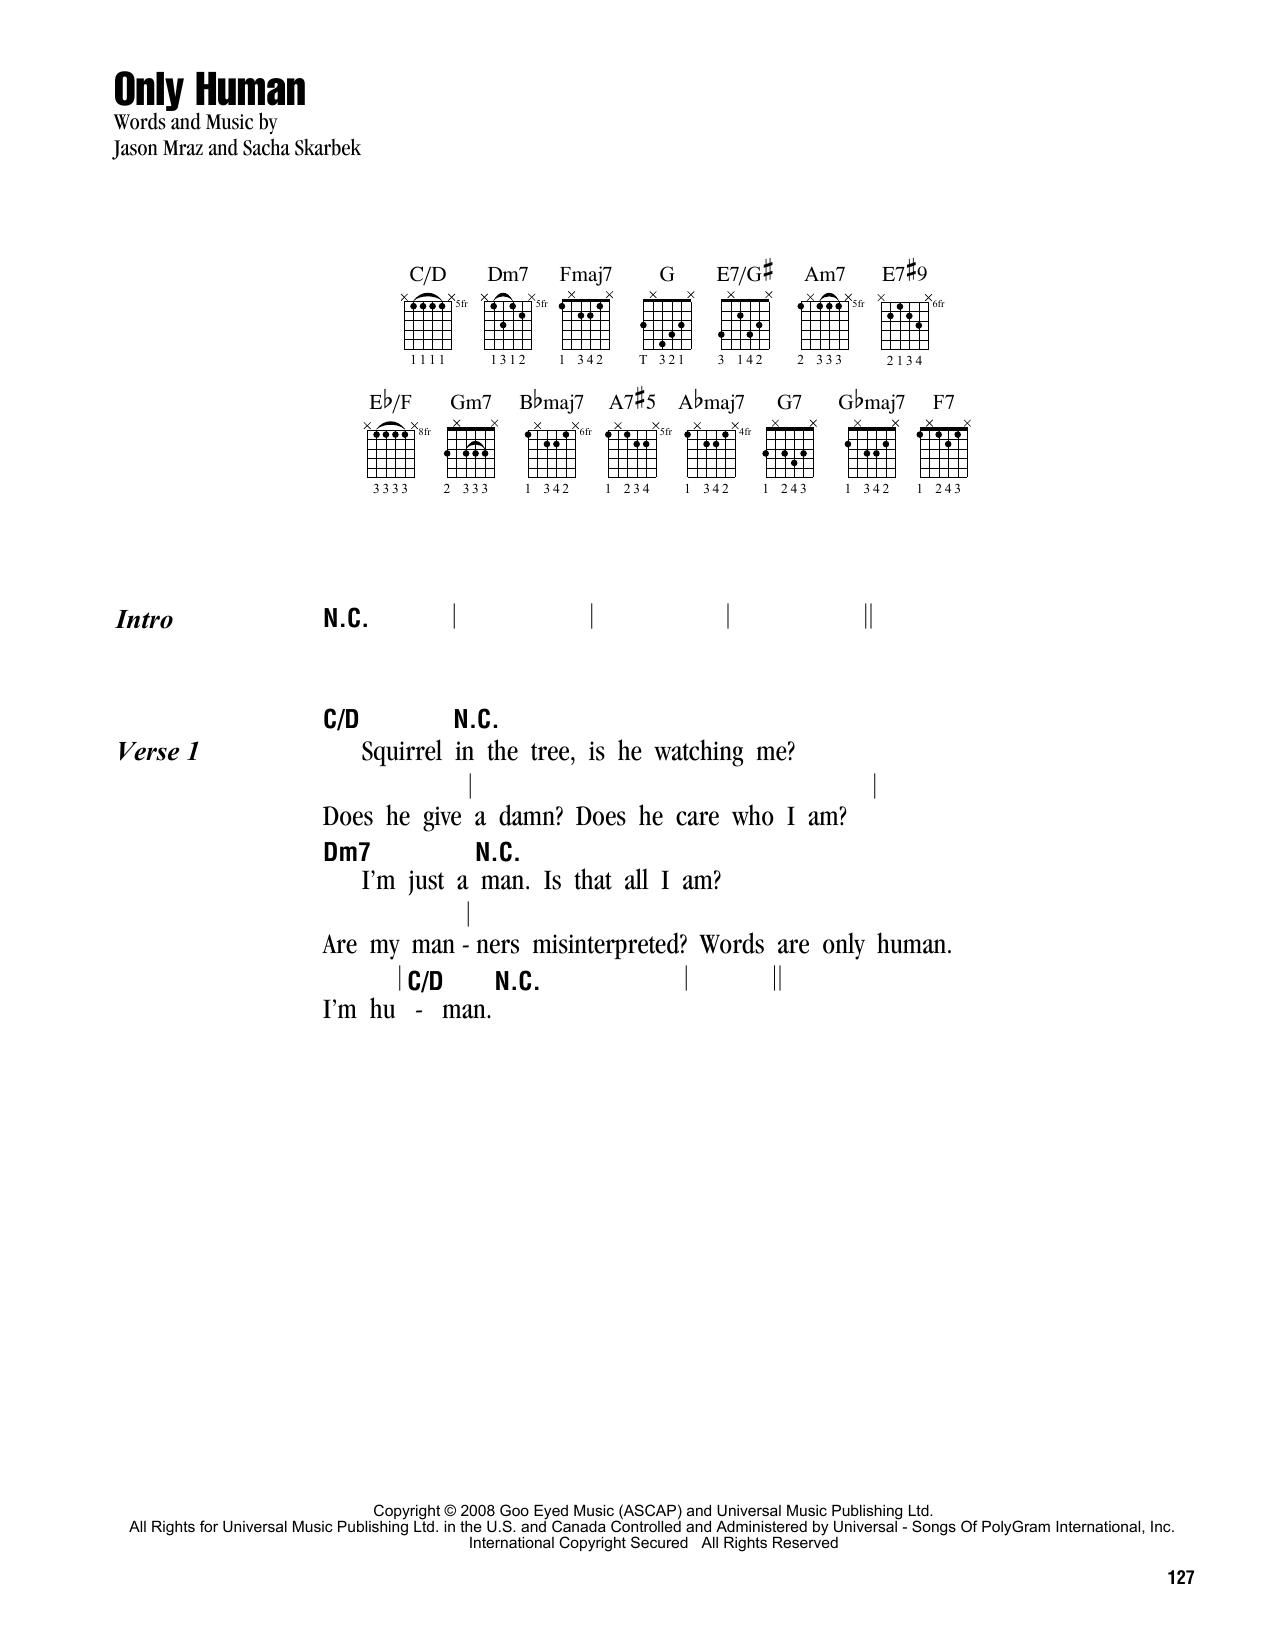 Only Human Sheet Music By Jason Mraz Lyrics Chords 162812